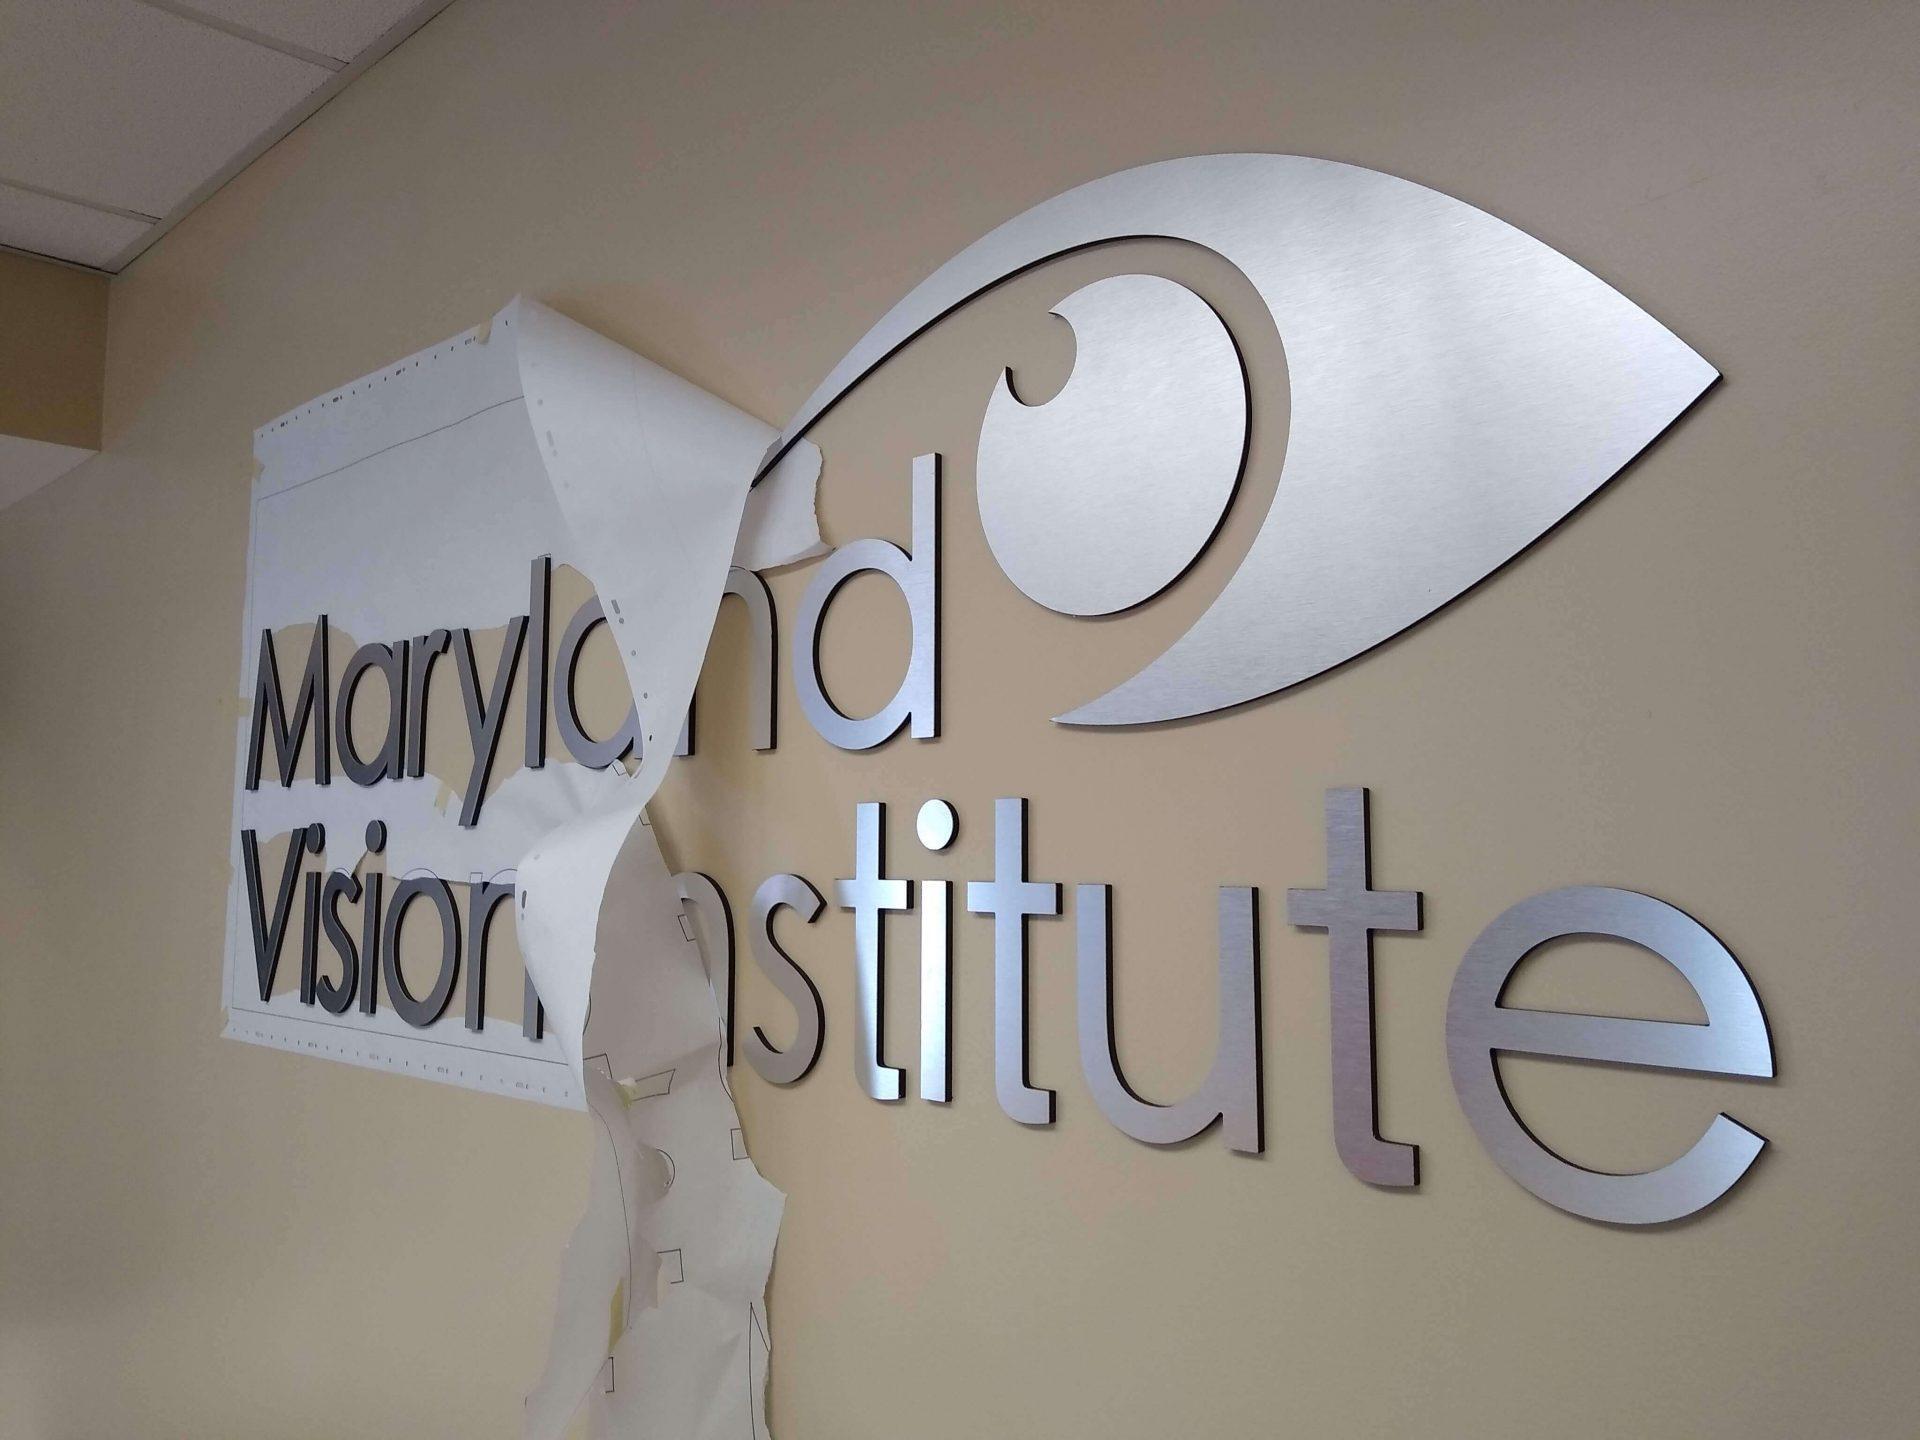 Brushed Metal Logo for Maryland Vision Institute